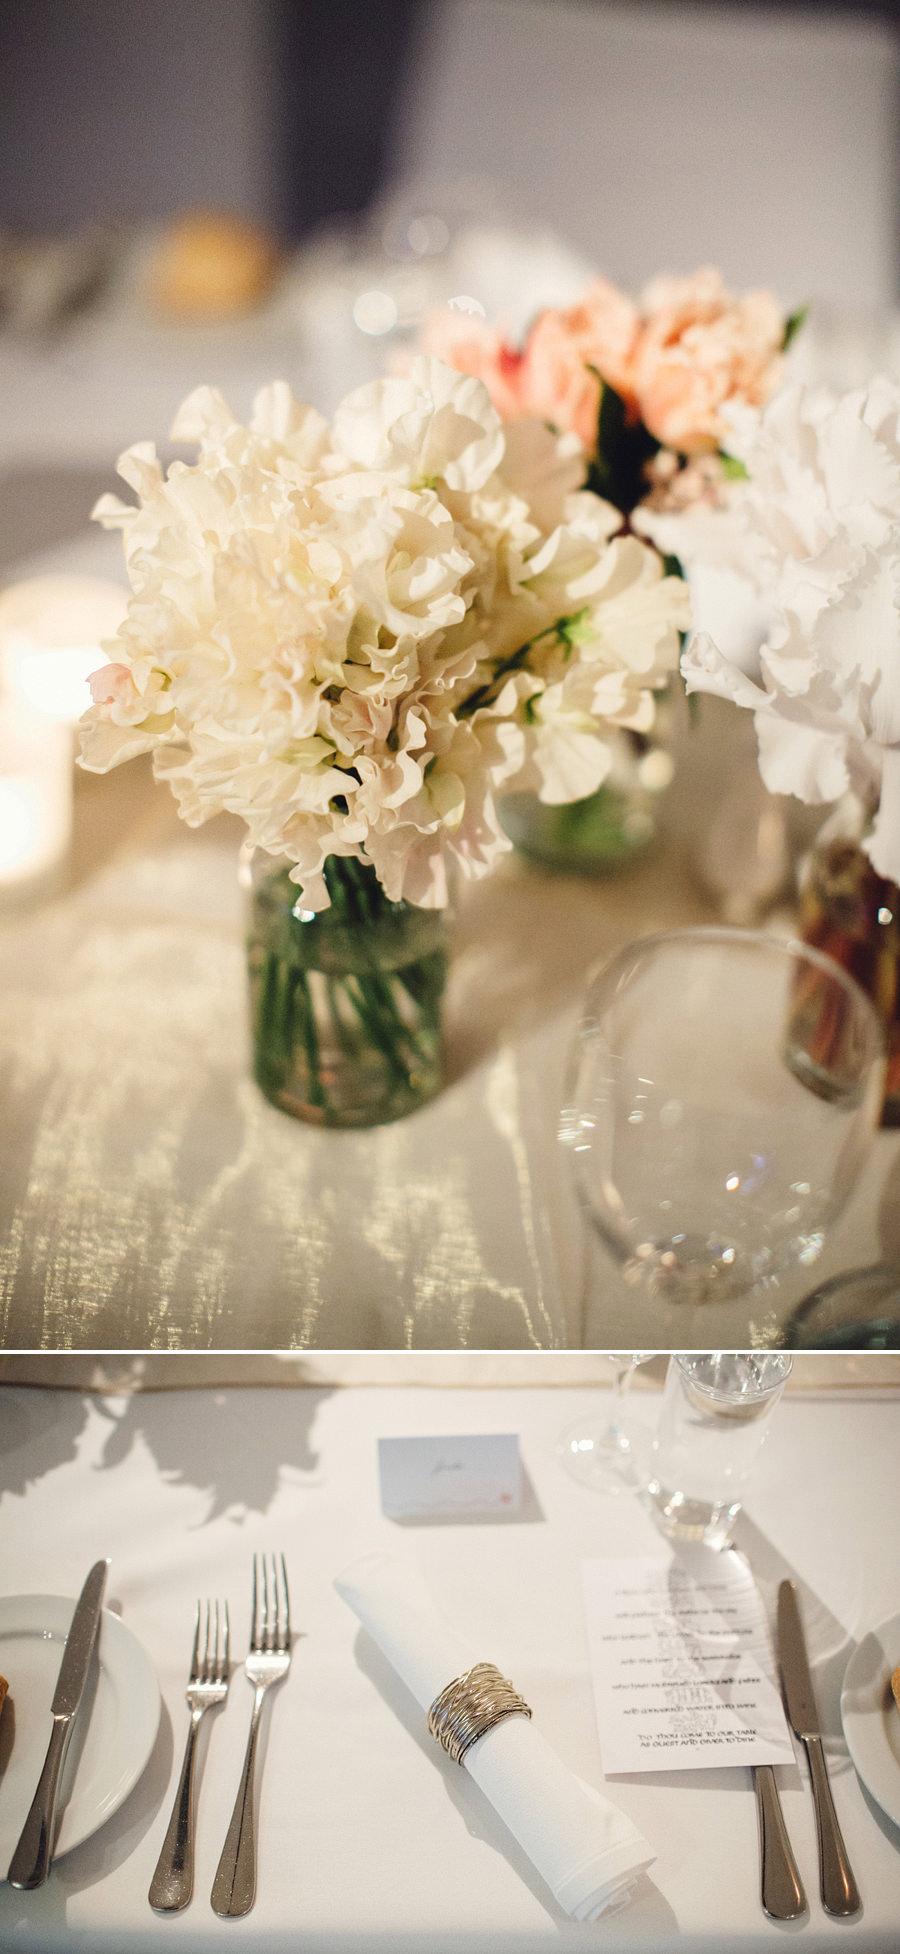 Zest Point Piper Wedding Photographers: Reception details